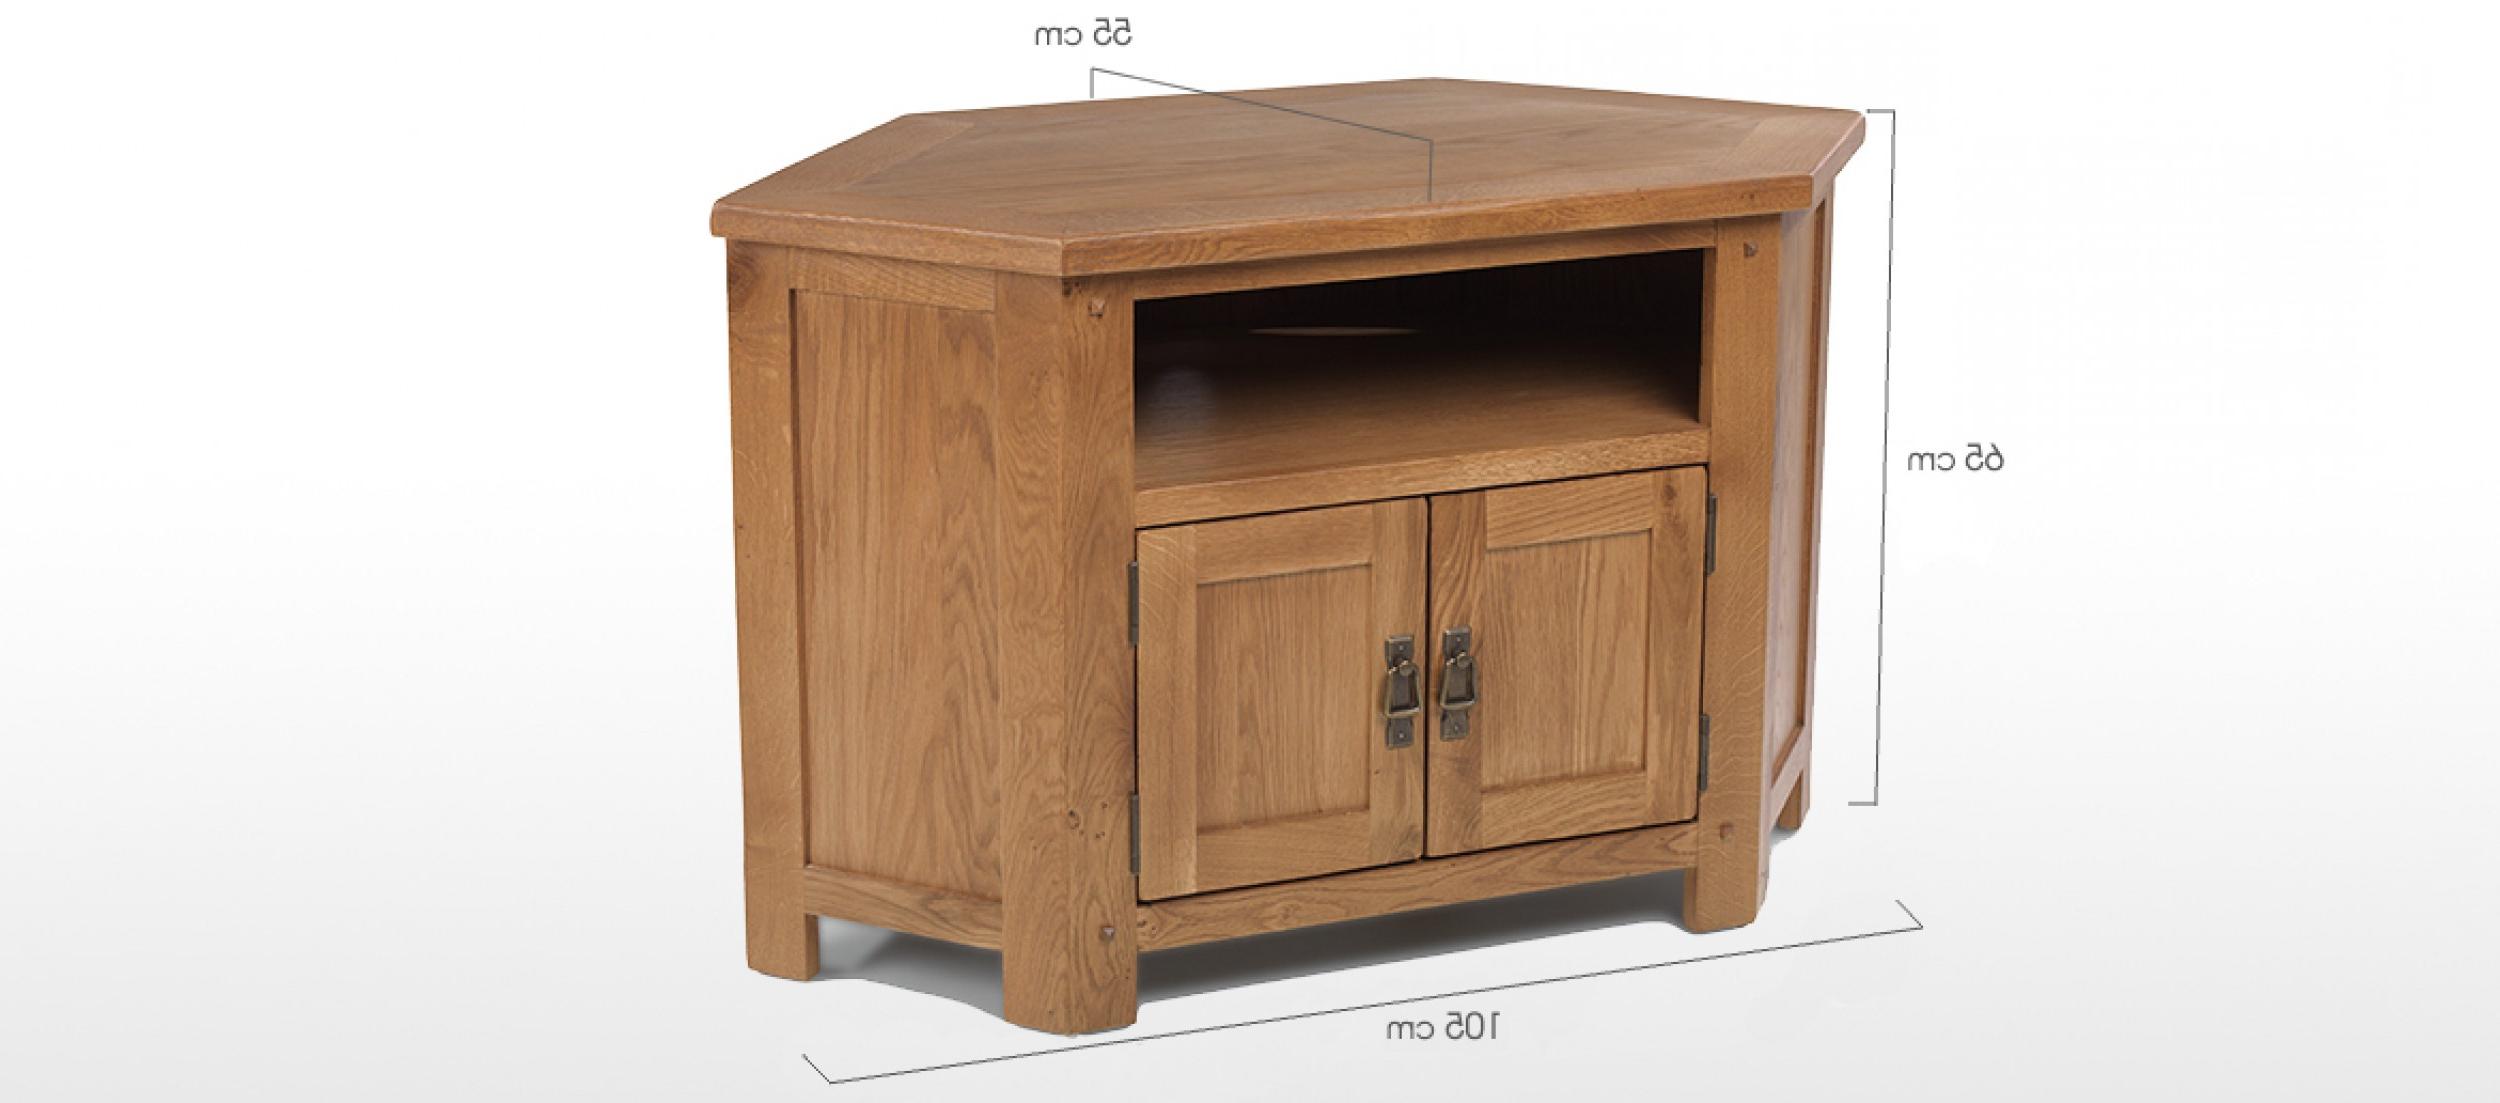 Most Current Dark Wood Corner Tv Cabinets Regarding Rustic Oak Corner Tv Cabinet (View 3 of 20)